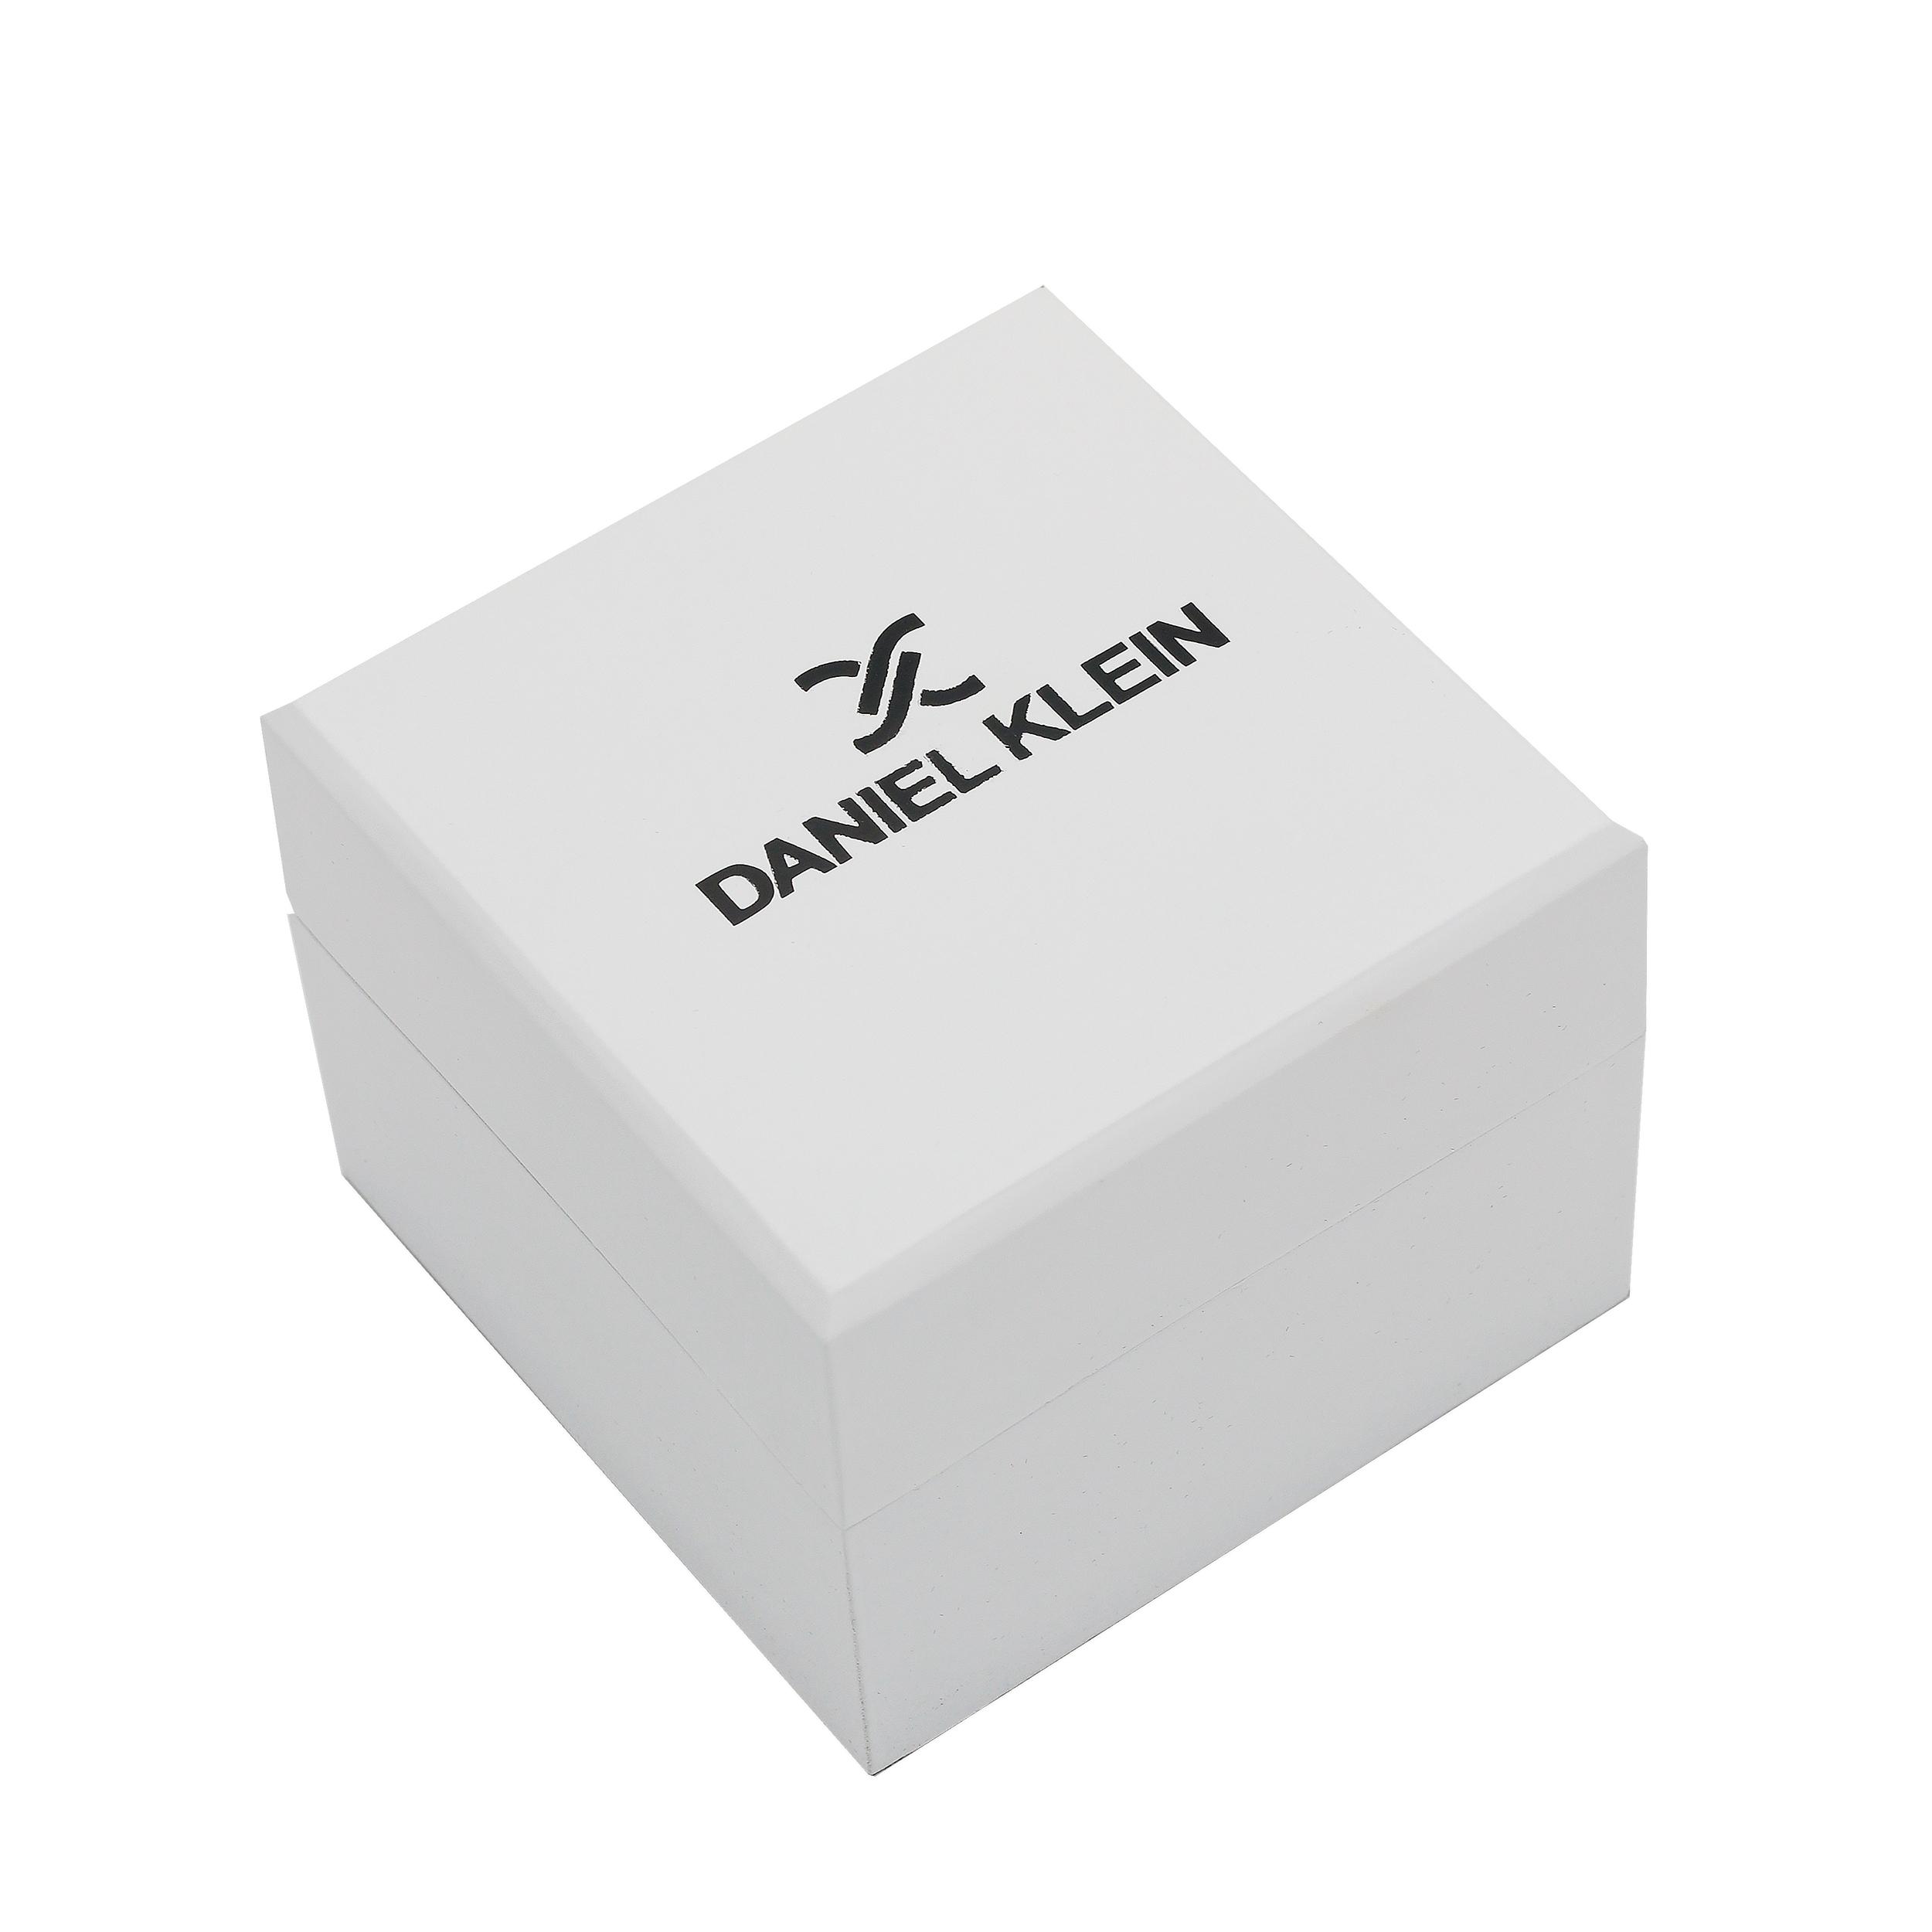 خرید و قیمت                      ساعت مچی  زنانه دنیل کلین مدل DK12065-1